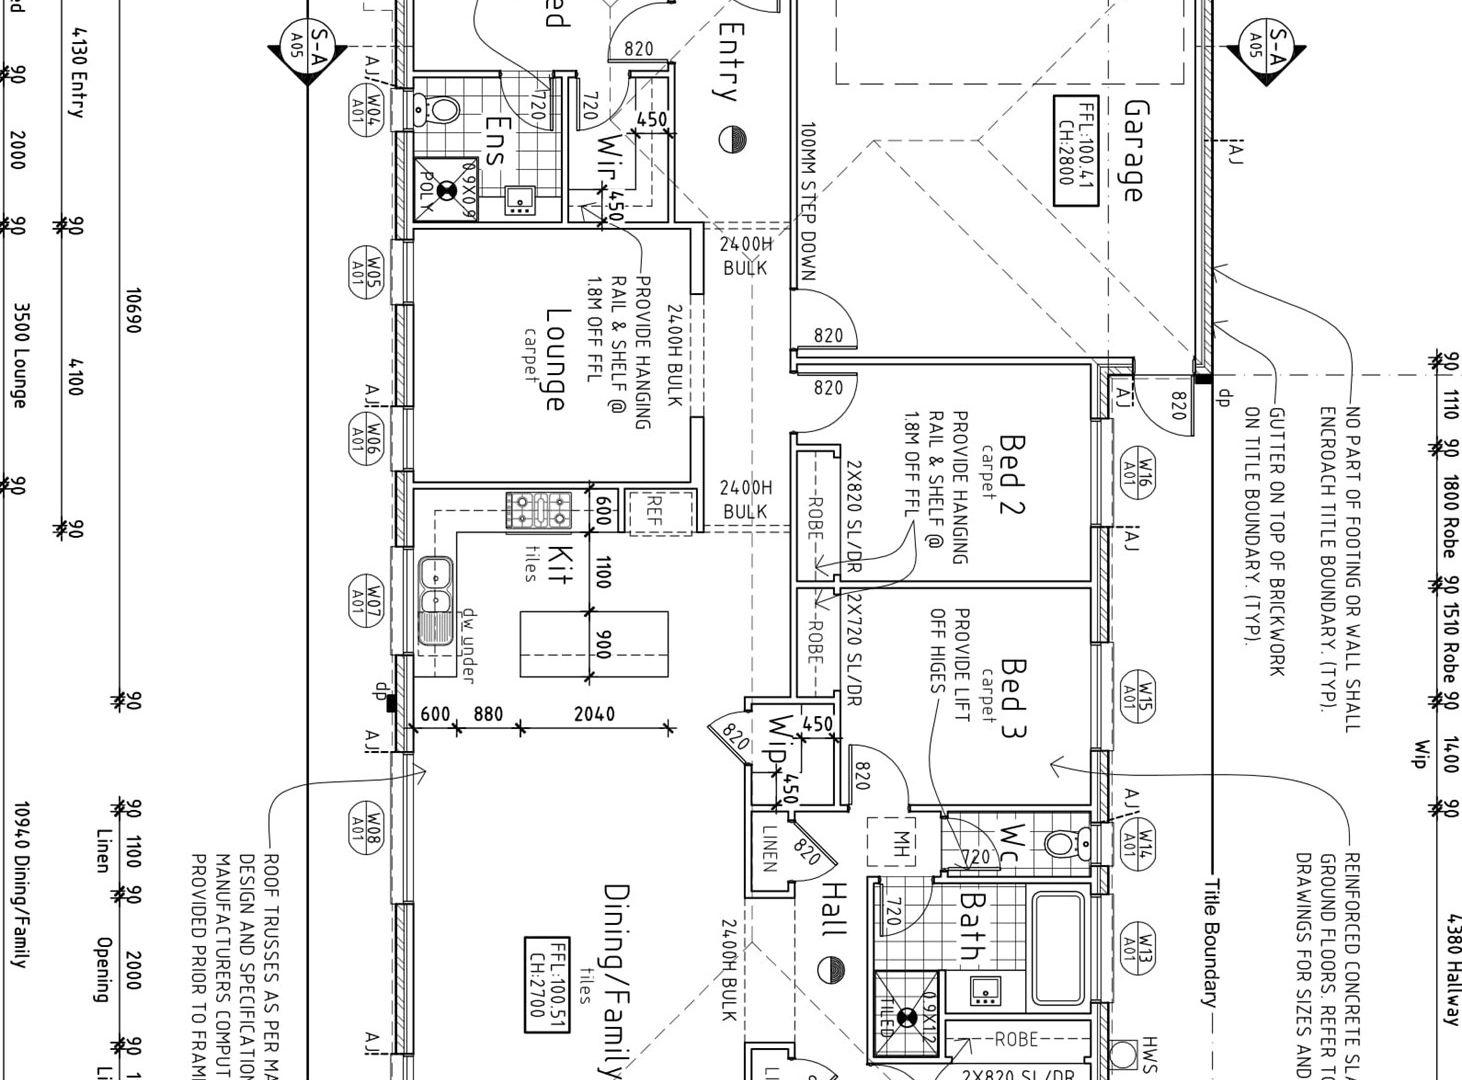 Lot 20380 Bunting Crescent, Kalkallo VIC 3064, Image 2